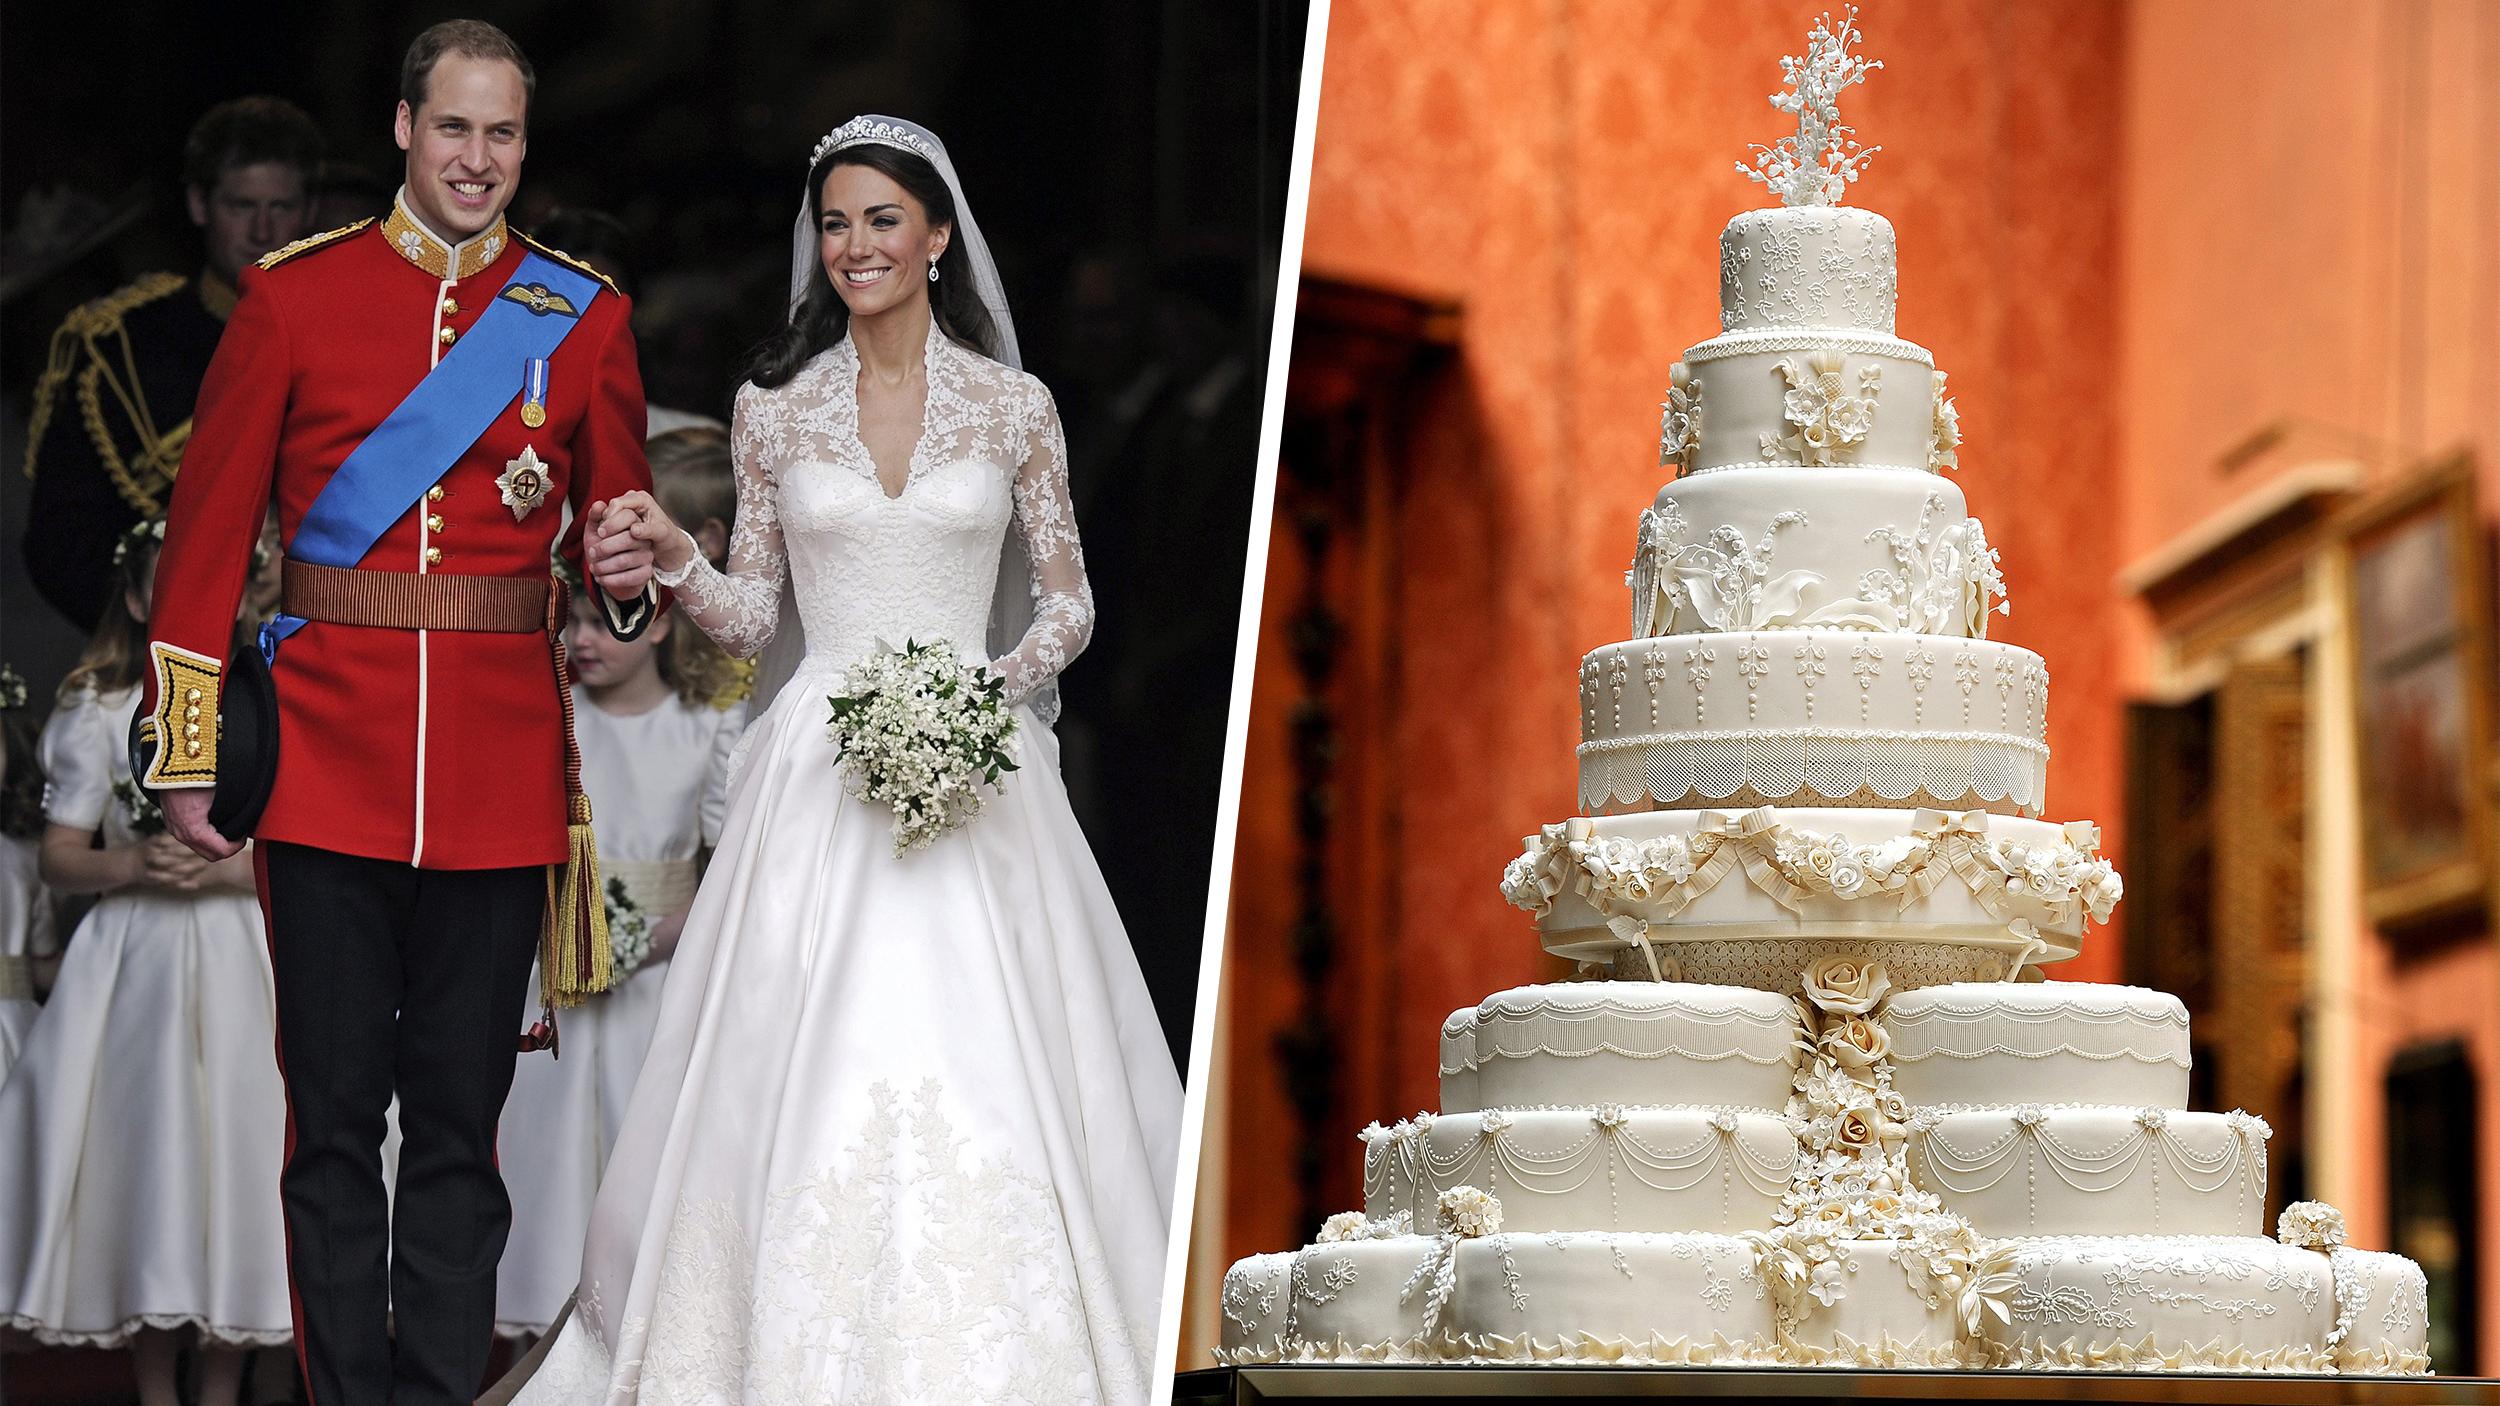 William and kate wedding cake tin